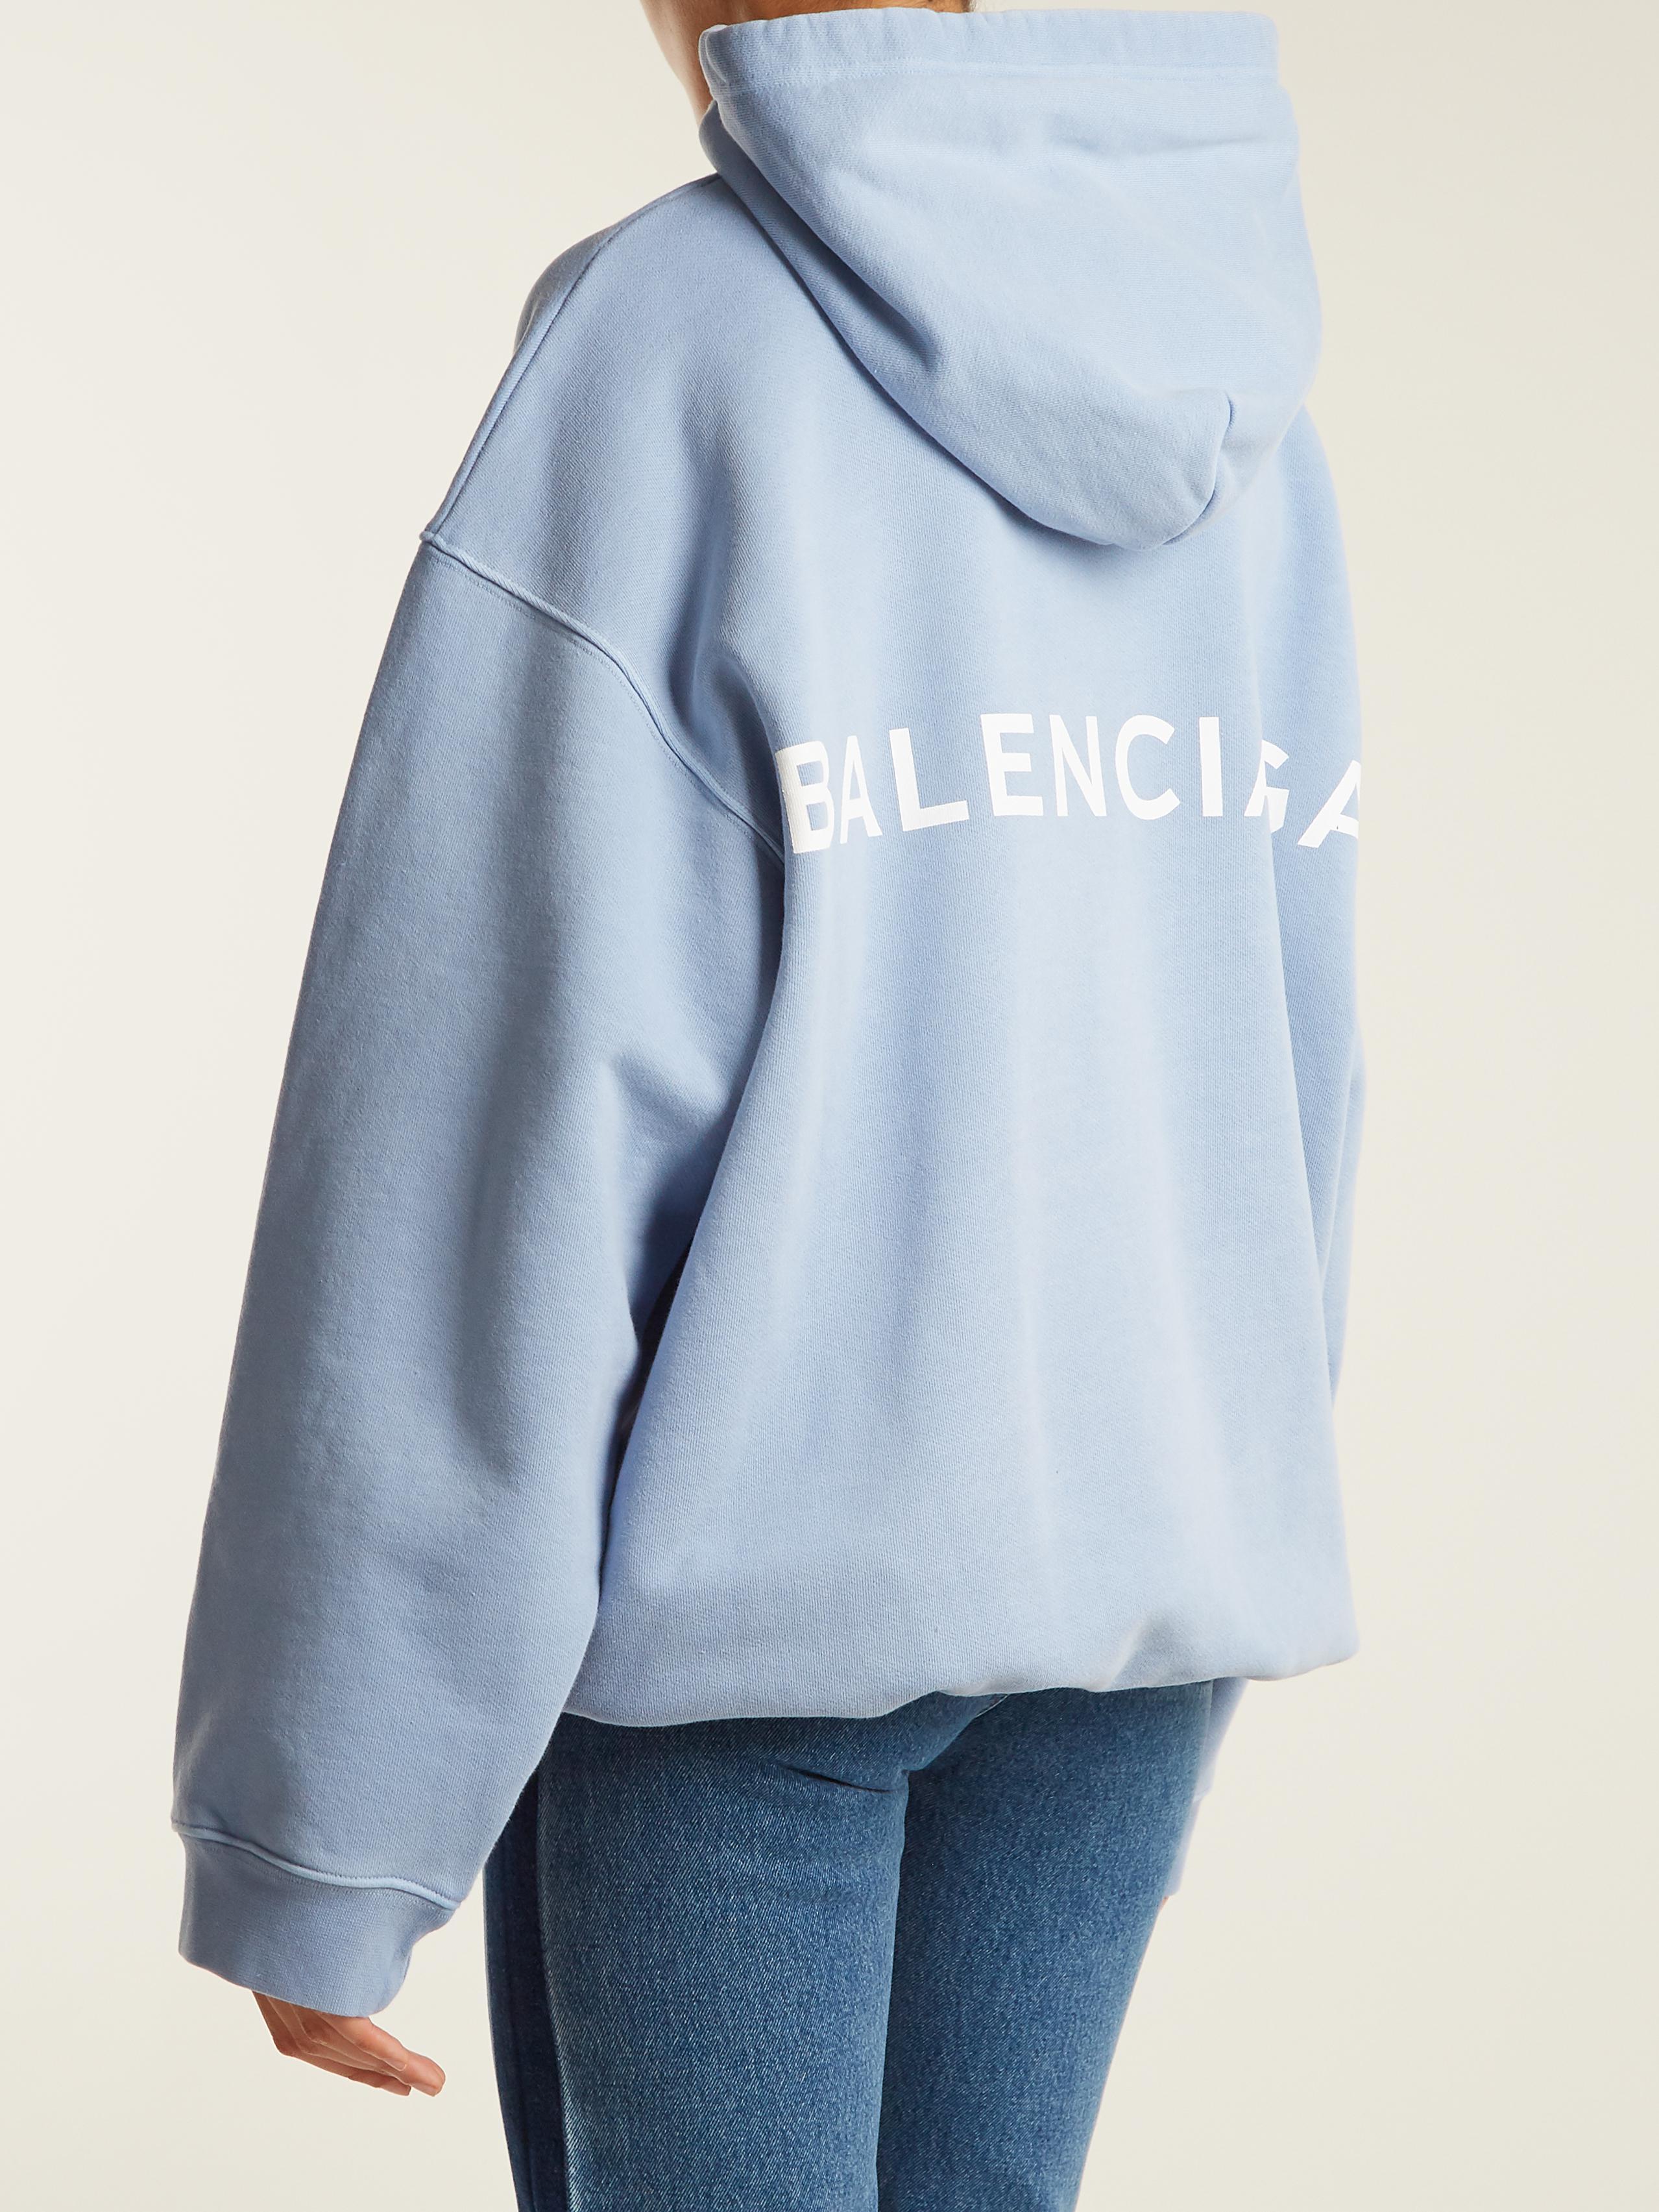 Lyst Balenciaga Hoodie Sweater In Blue